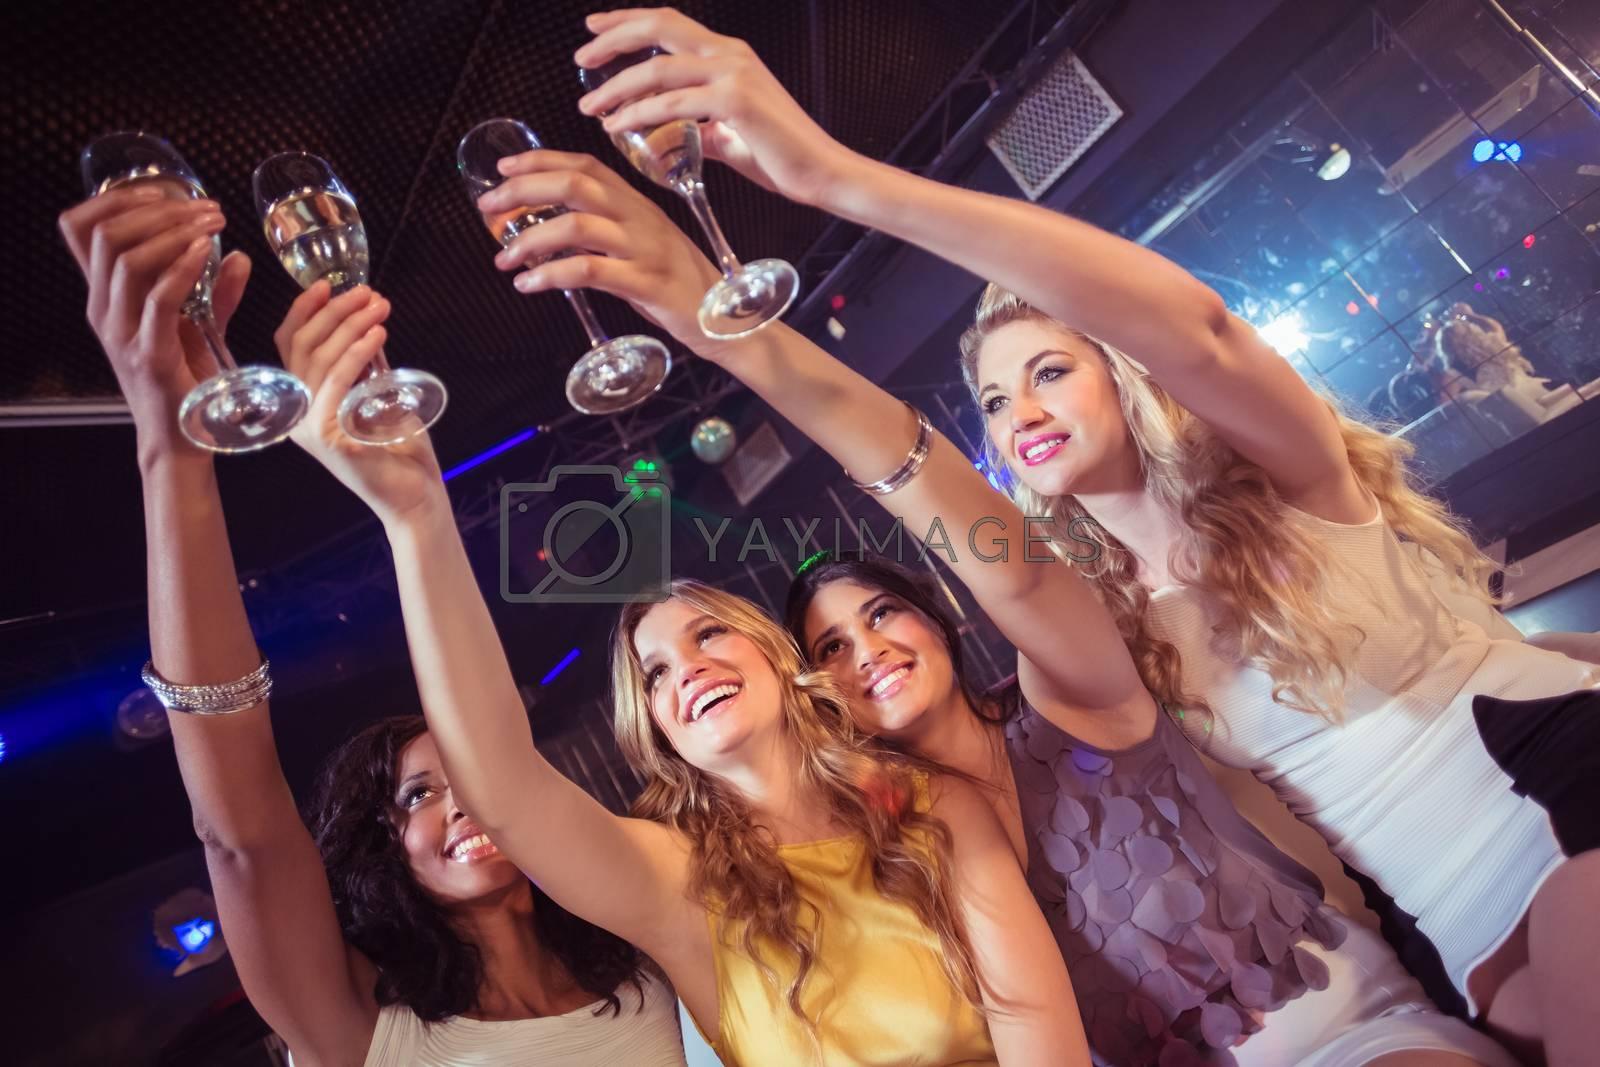 Pretty girls holding champagne glass by Wavebreakmedia